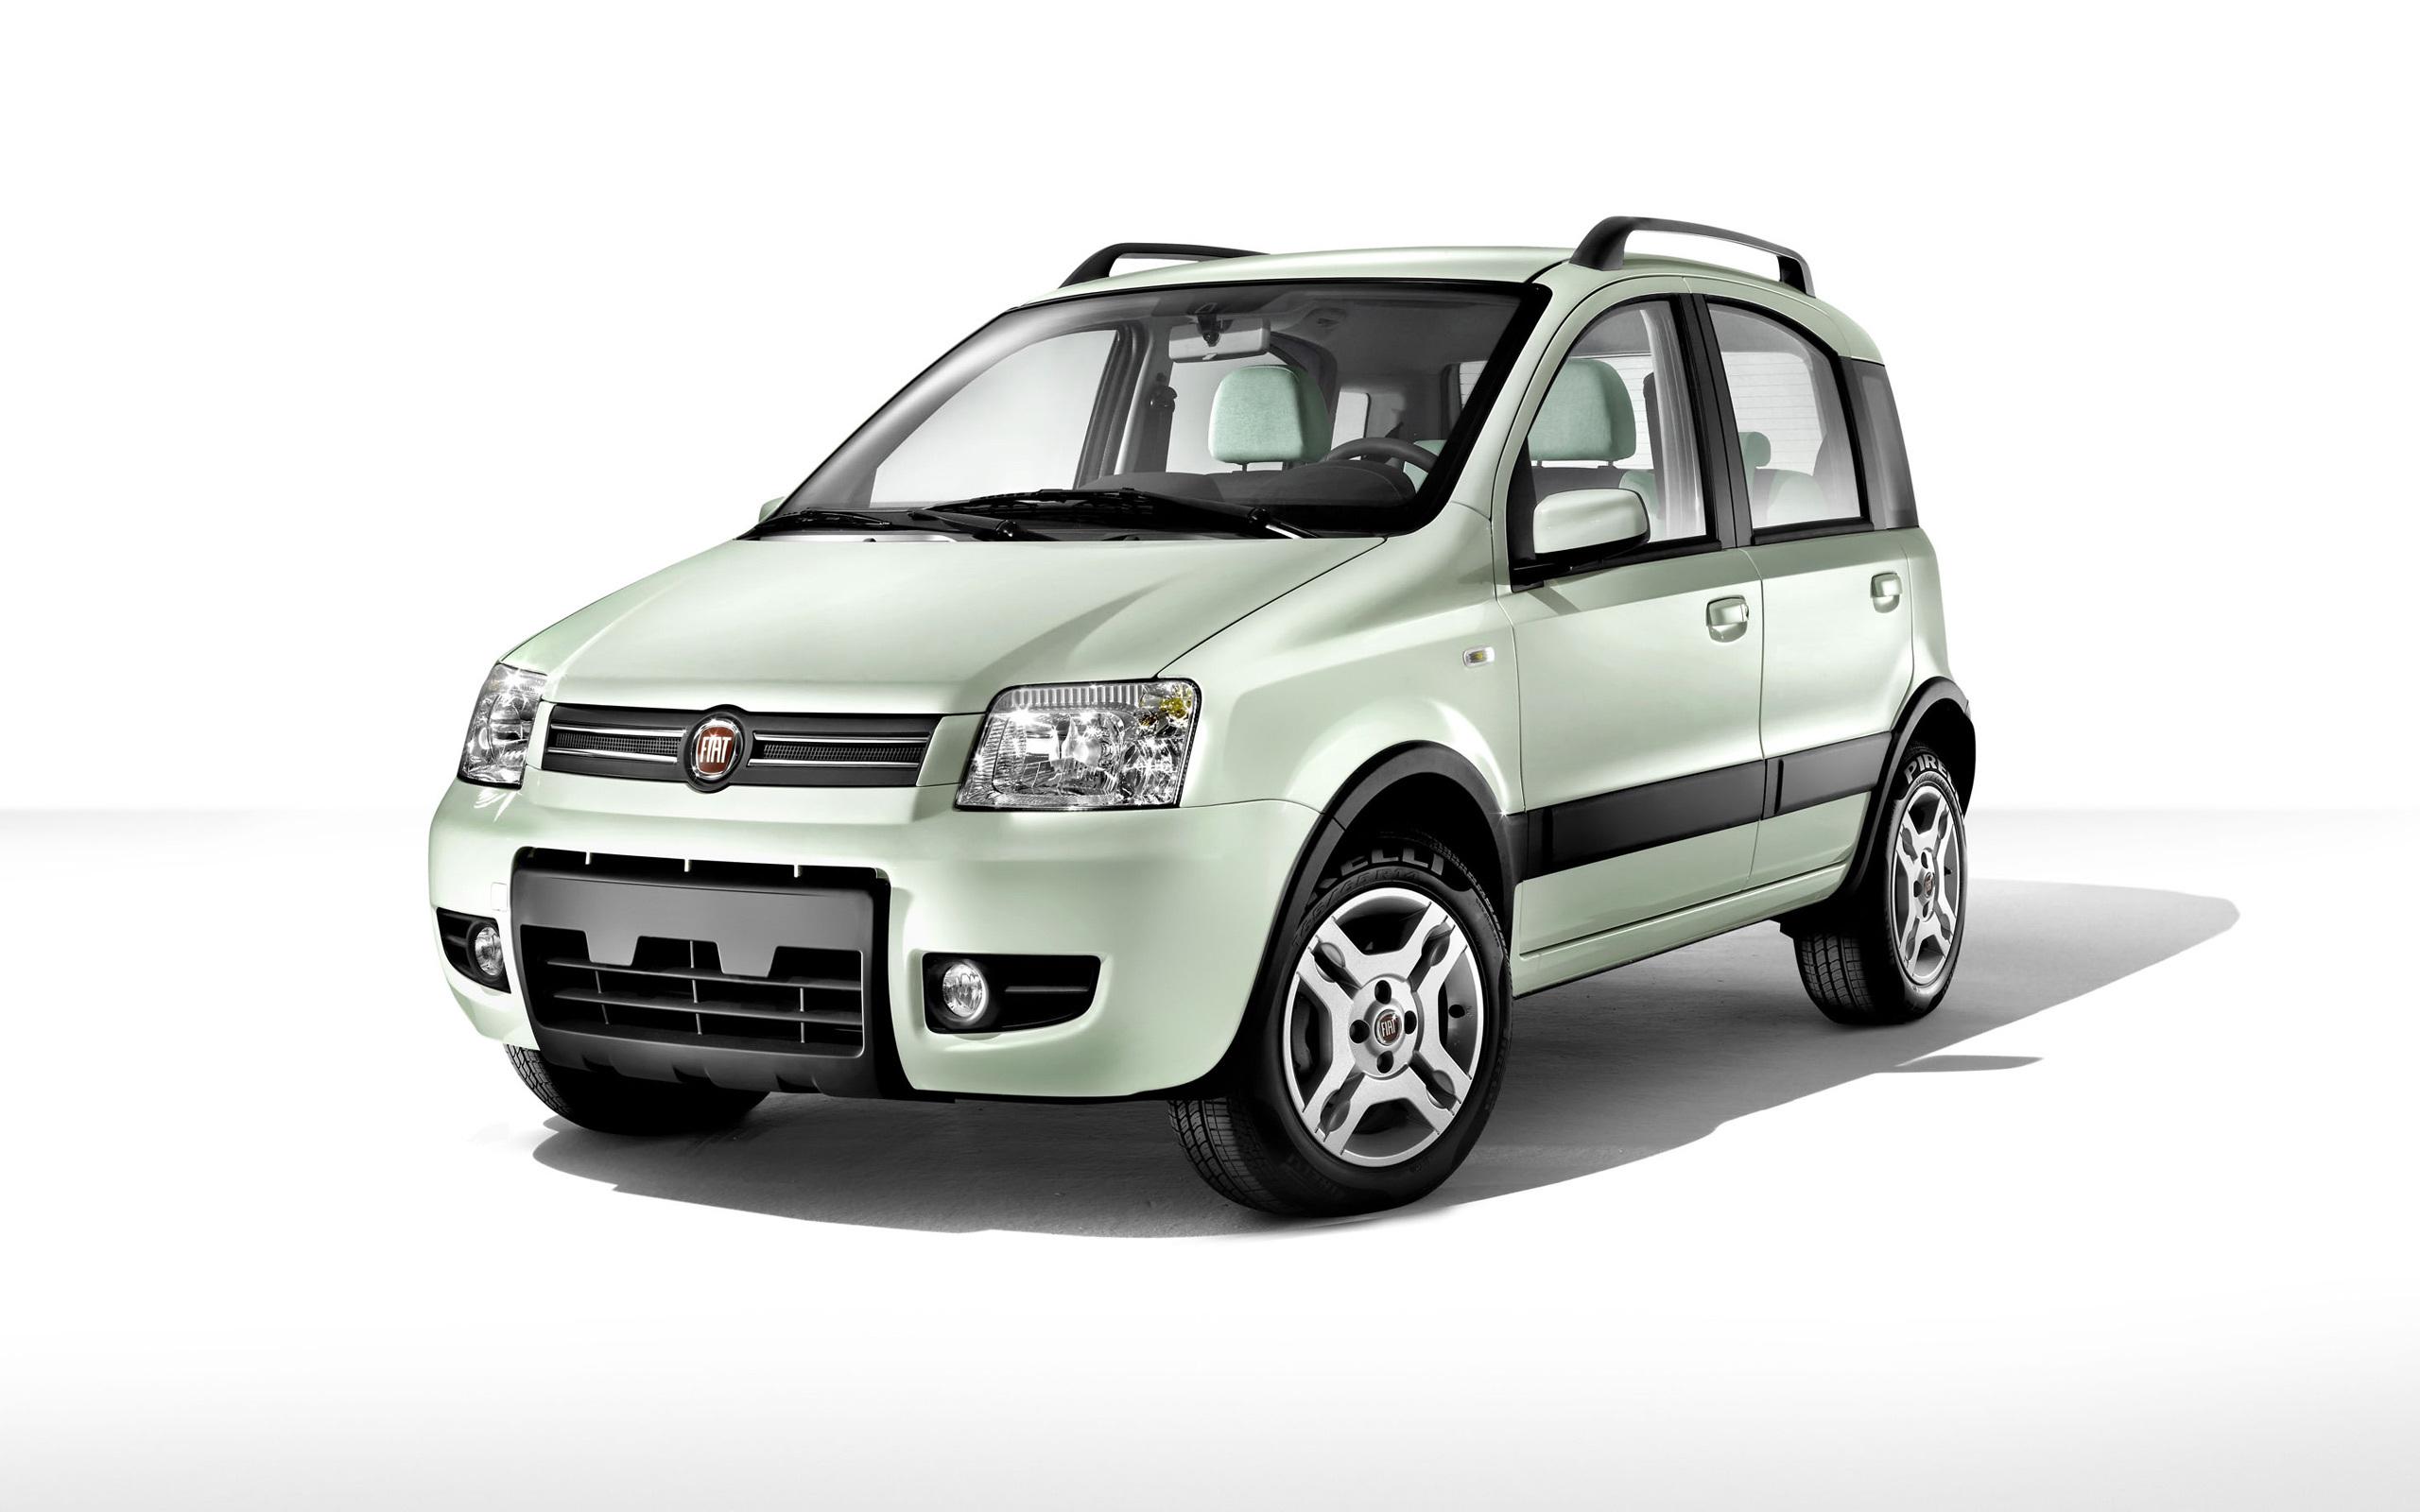 Fiat Panda Wallpaper 9   2560 X 1600 stmednet 2560x1600